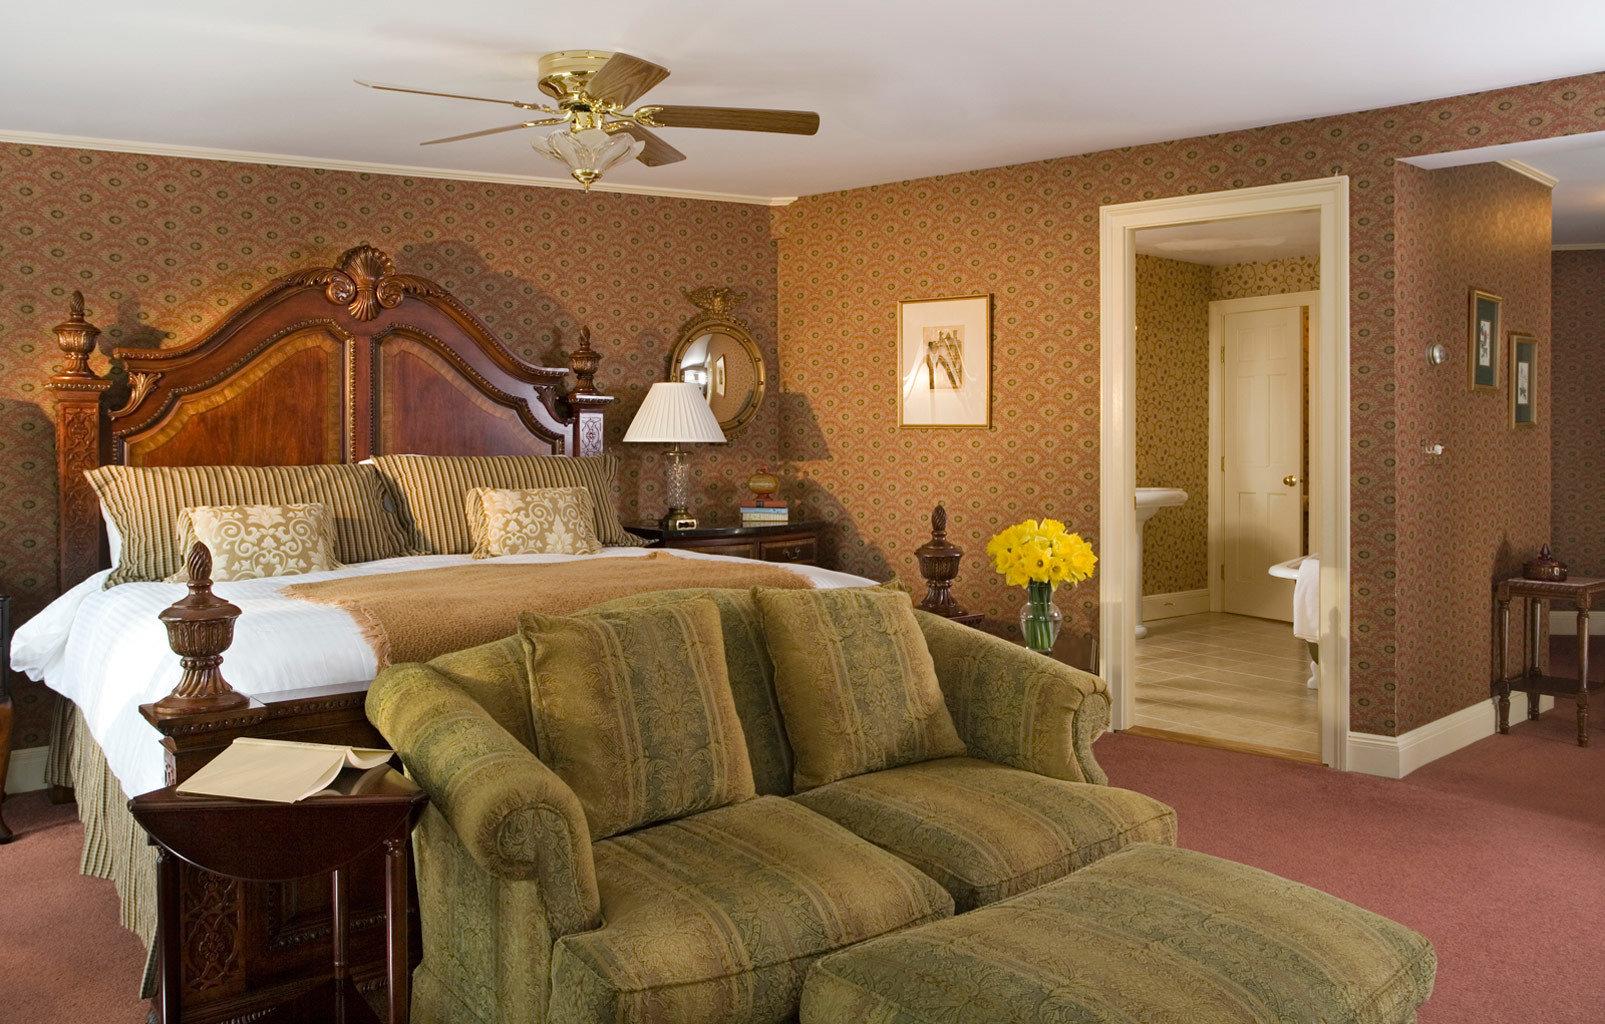 sofa property living room home Bedroom Suite hardwood cottage colored